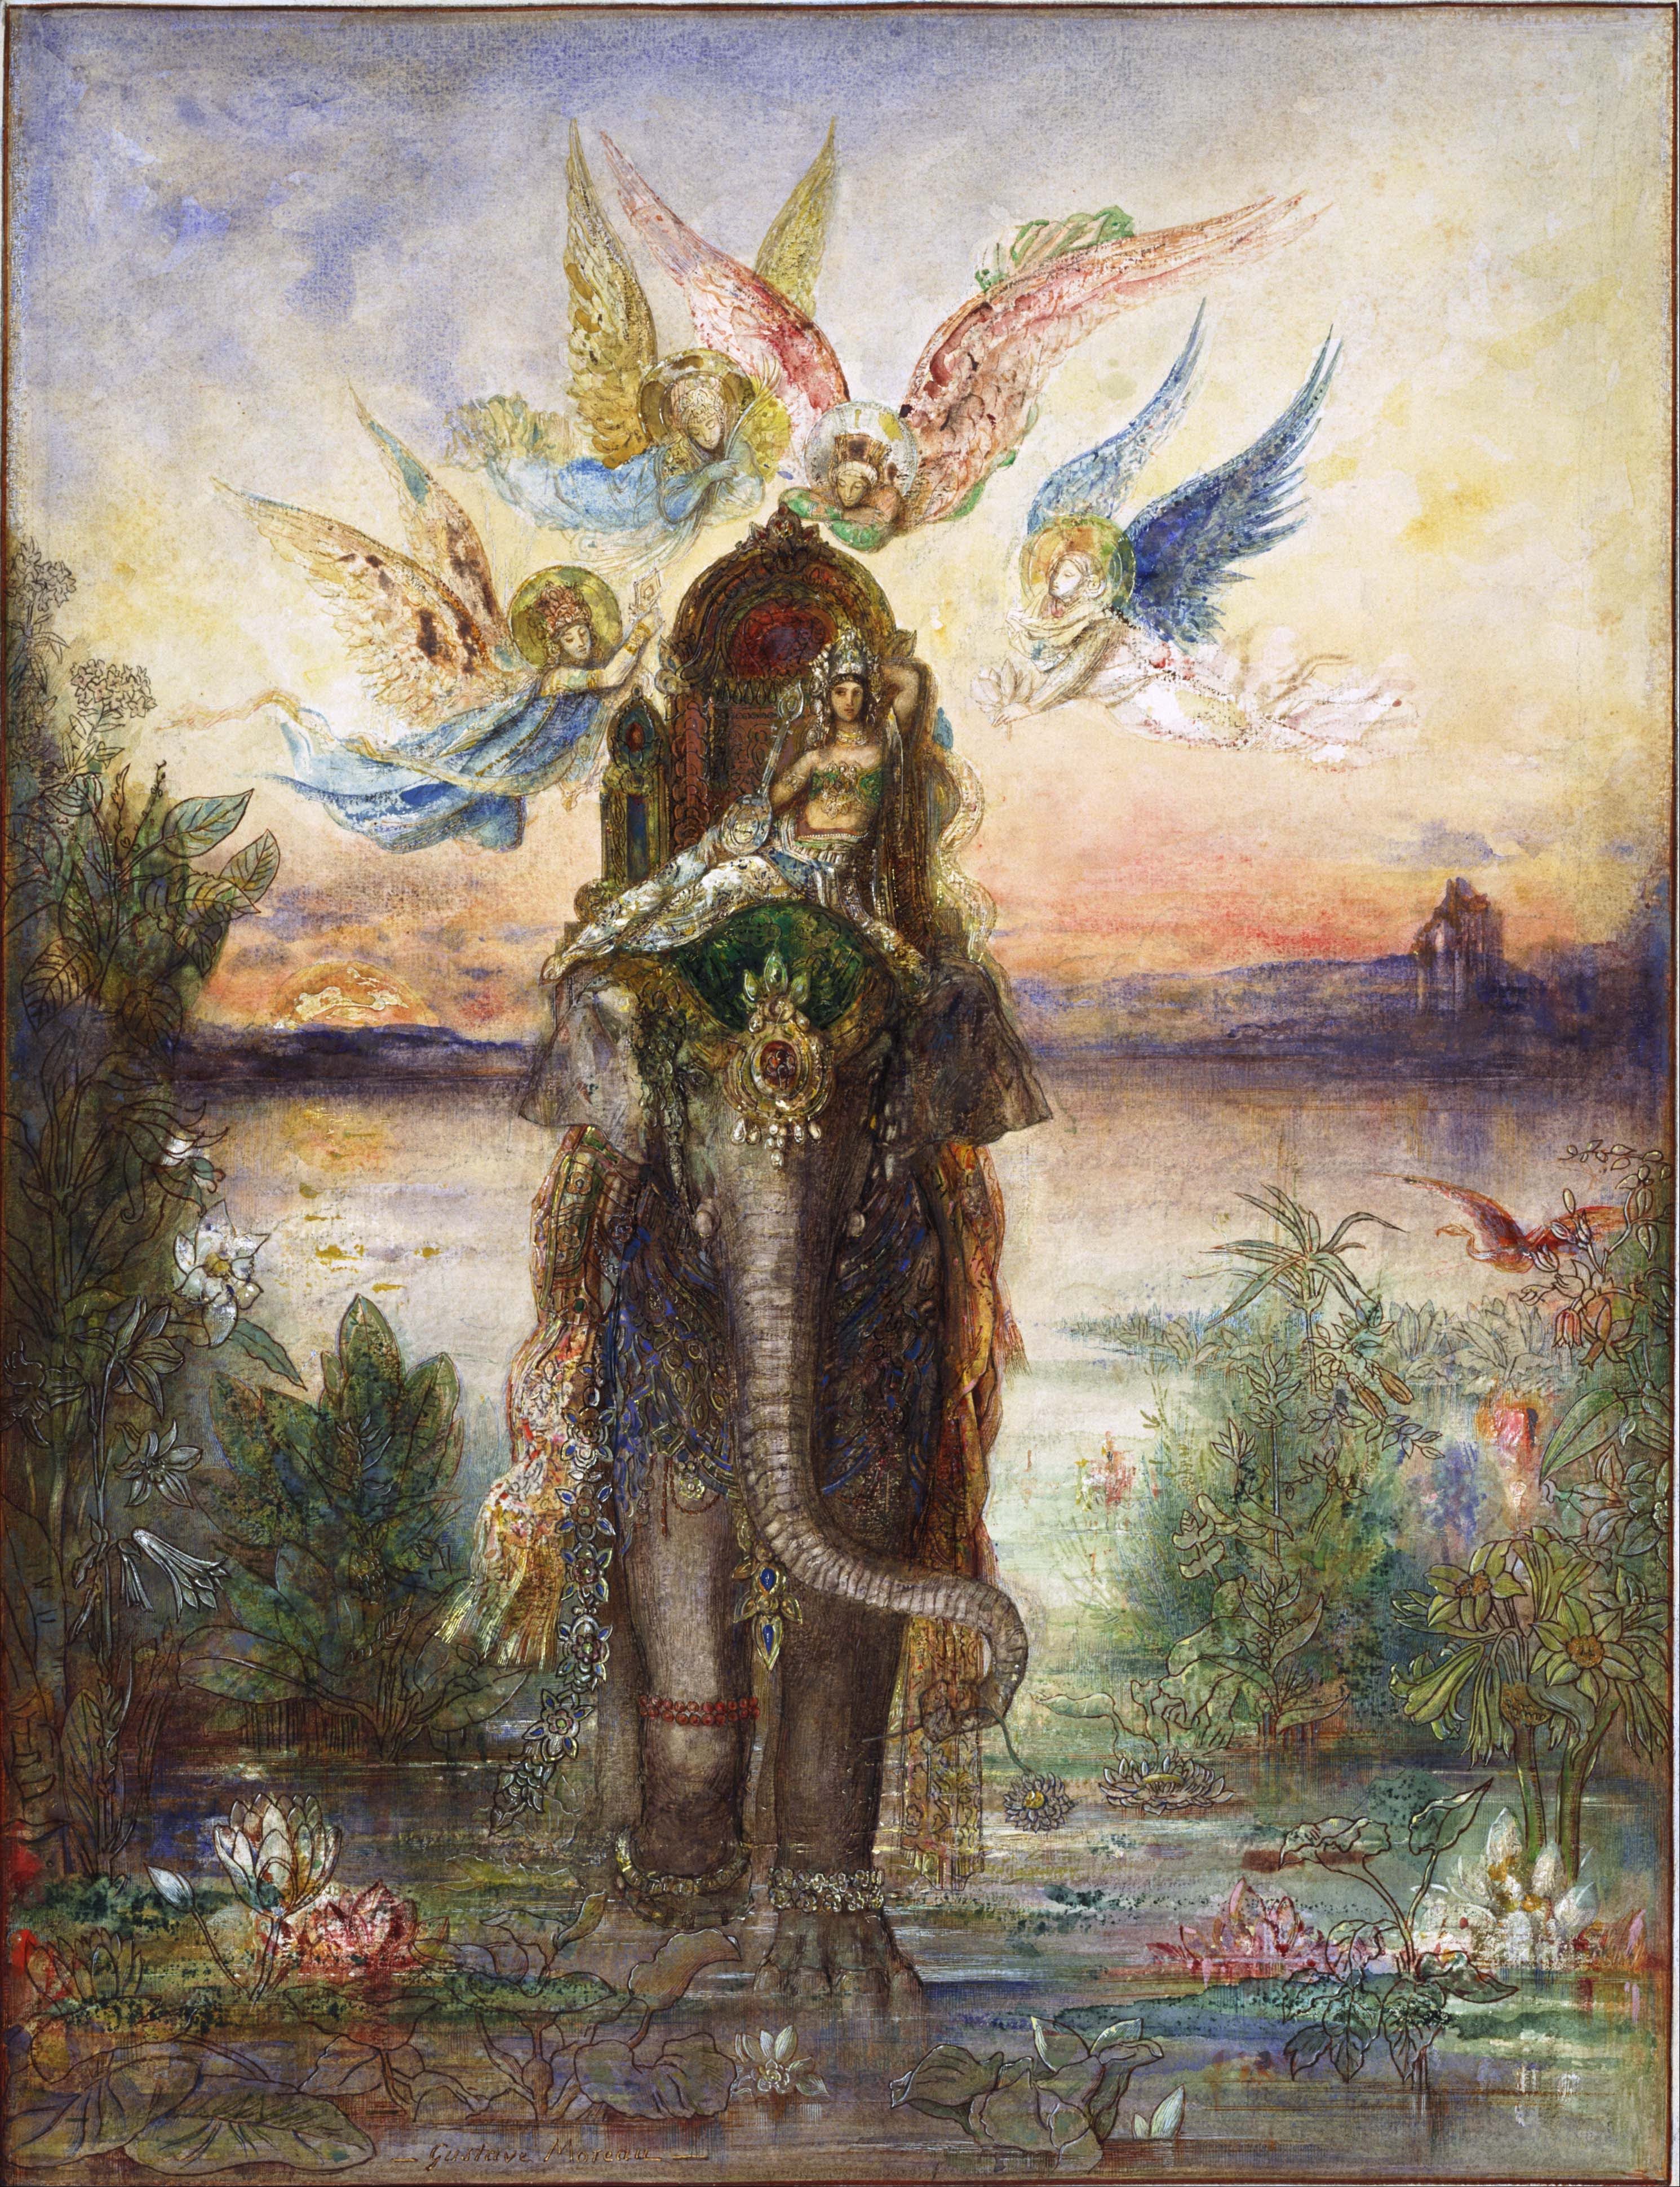 File:Gustave Moreau - The Sacred Elephant (Péri) - Google Art Project.jpg - W...